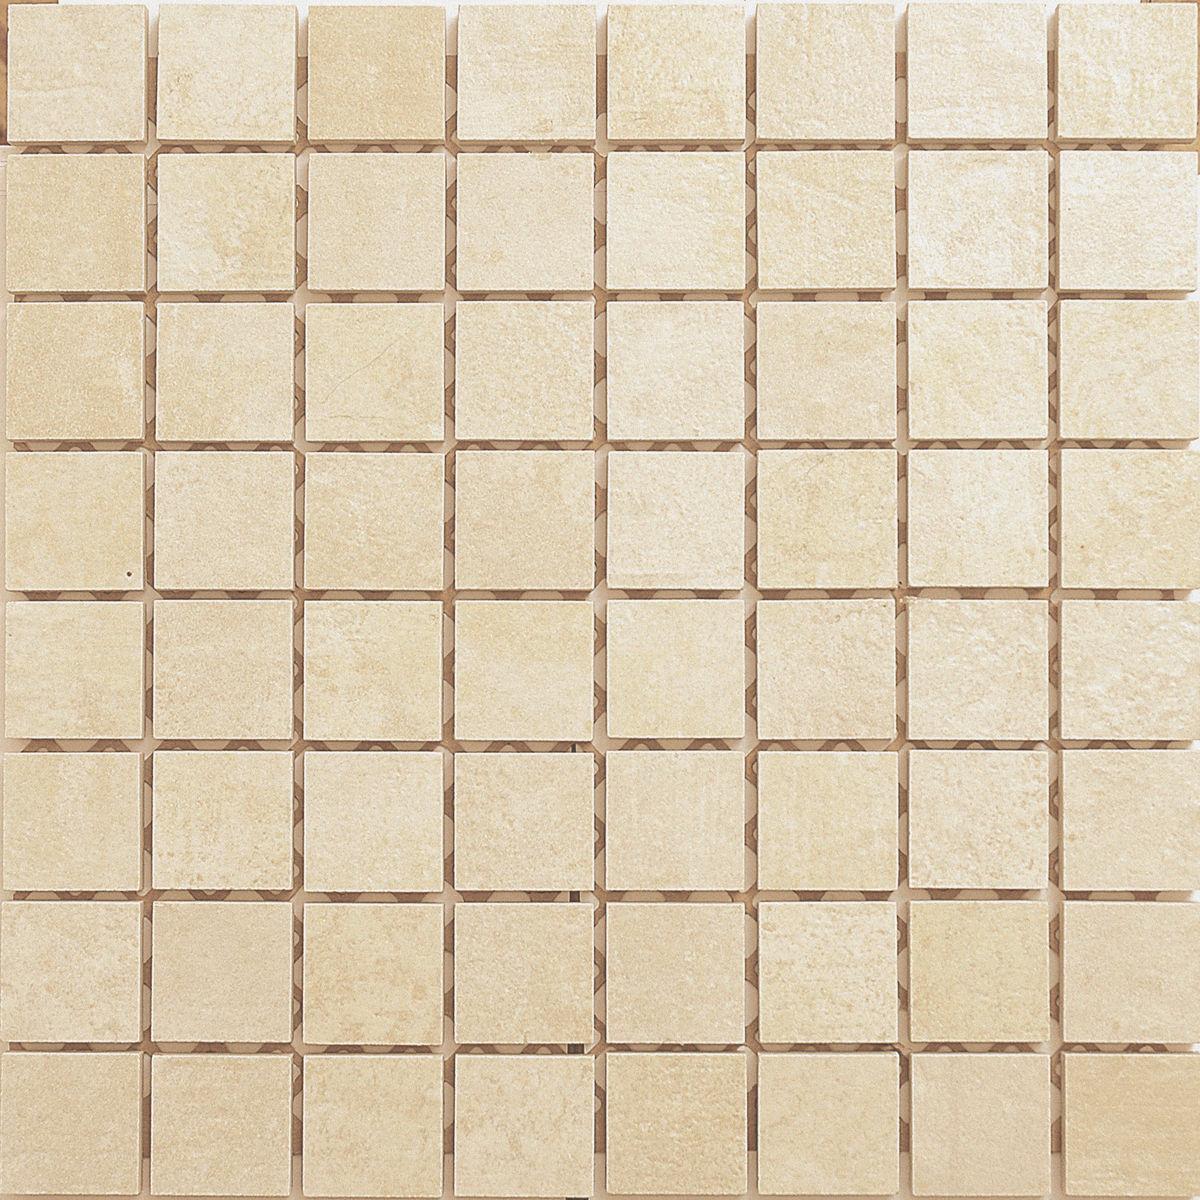 Керамогранит Zeus Ceramica Casa Cotto Classico Мозайка Beige 32.5х32.5 Mqax21